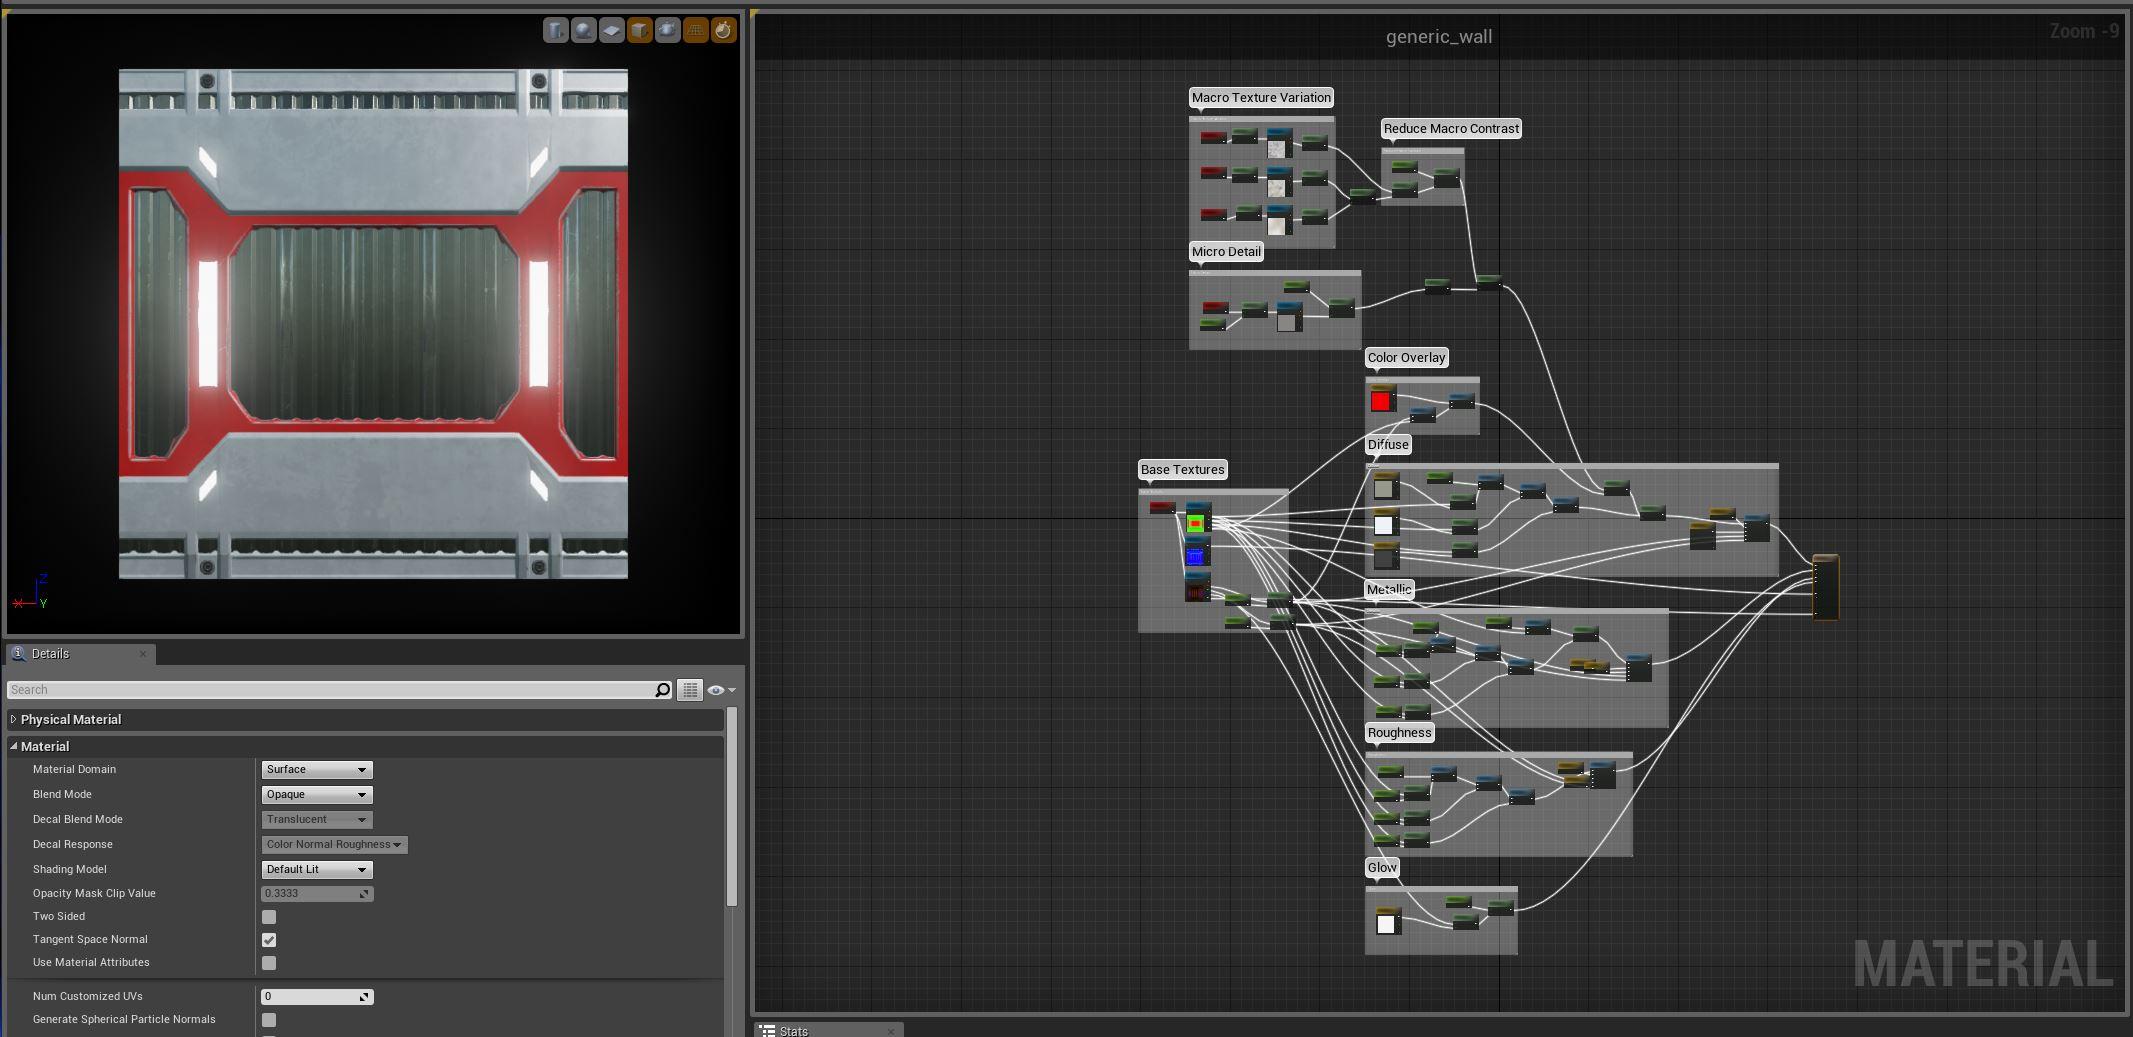 Semi-procedural material in Unity